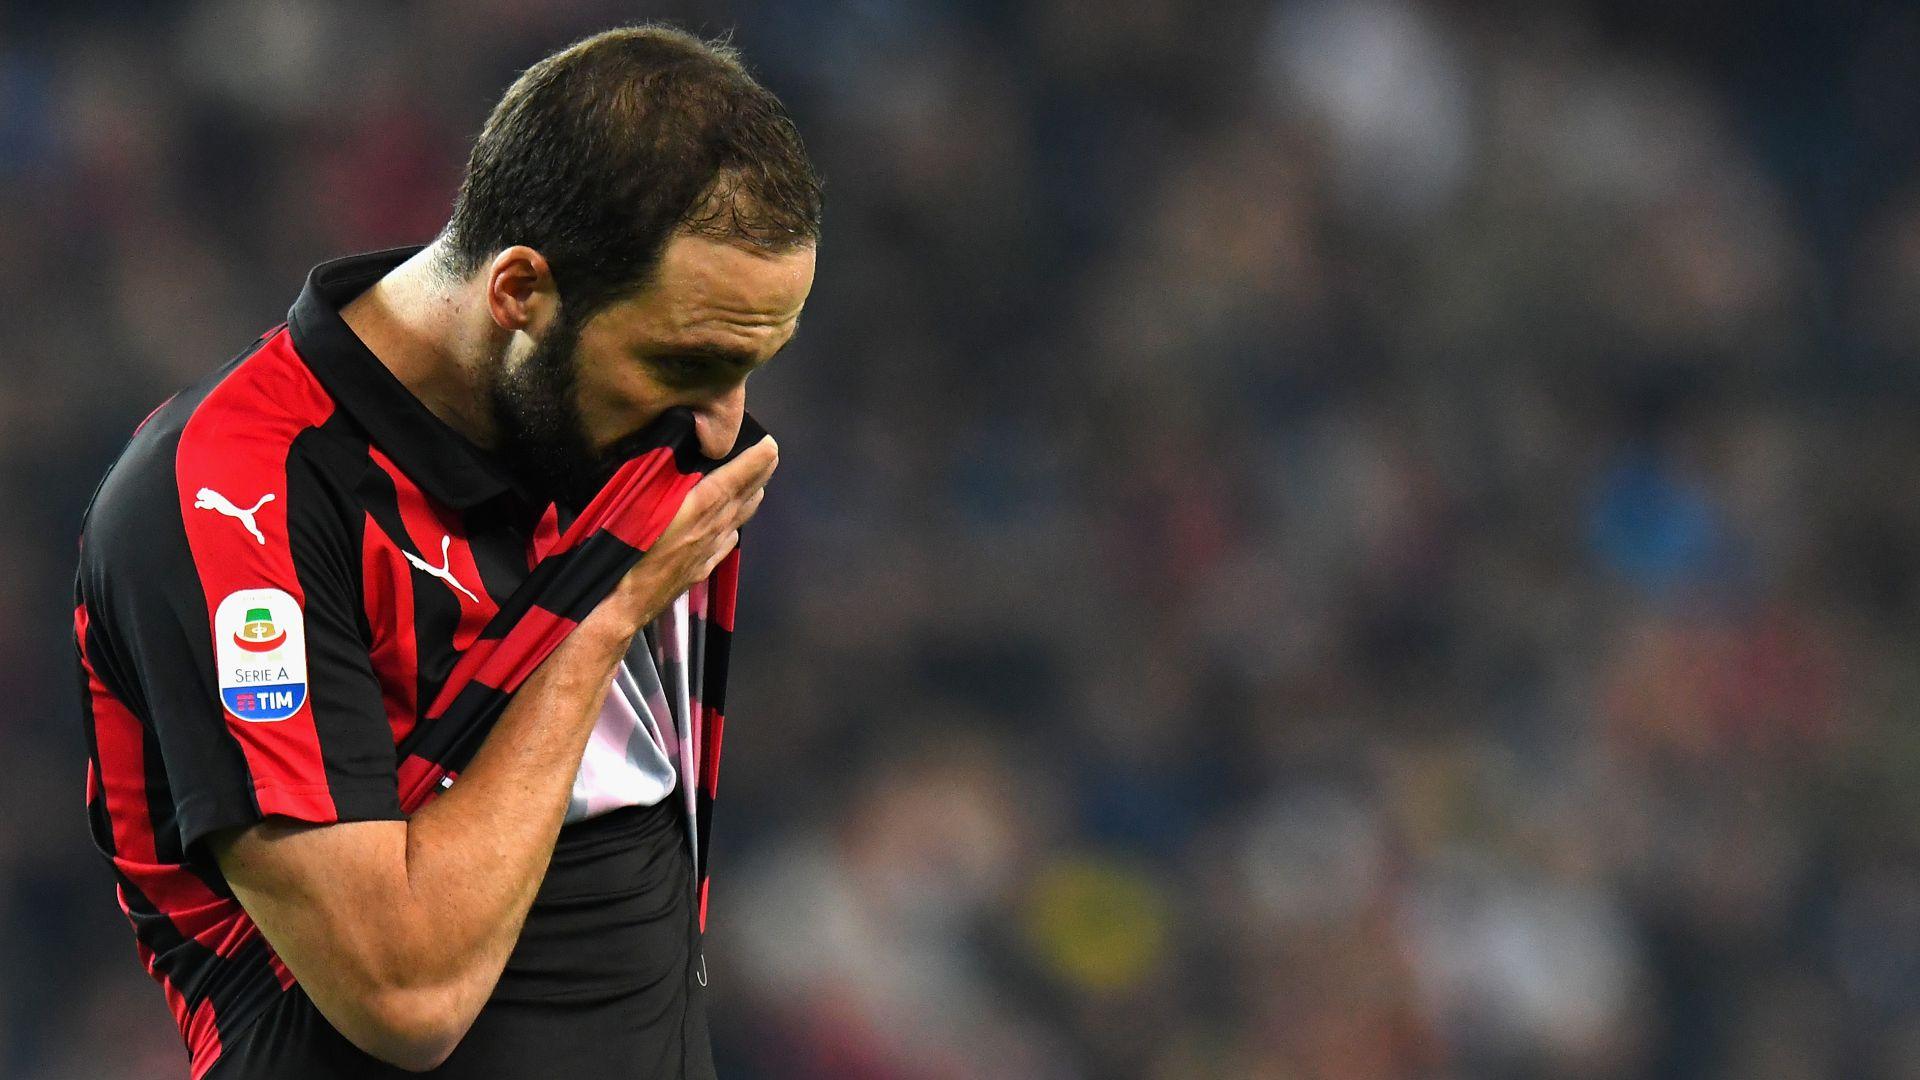 Solita Juventus, manca il secondo giallo per Benatia